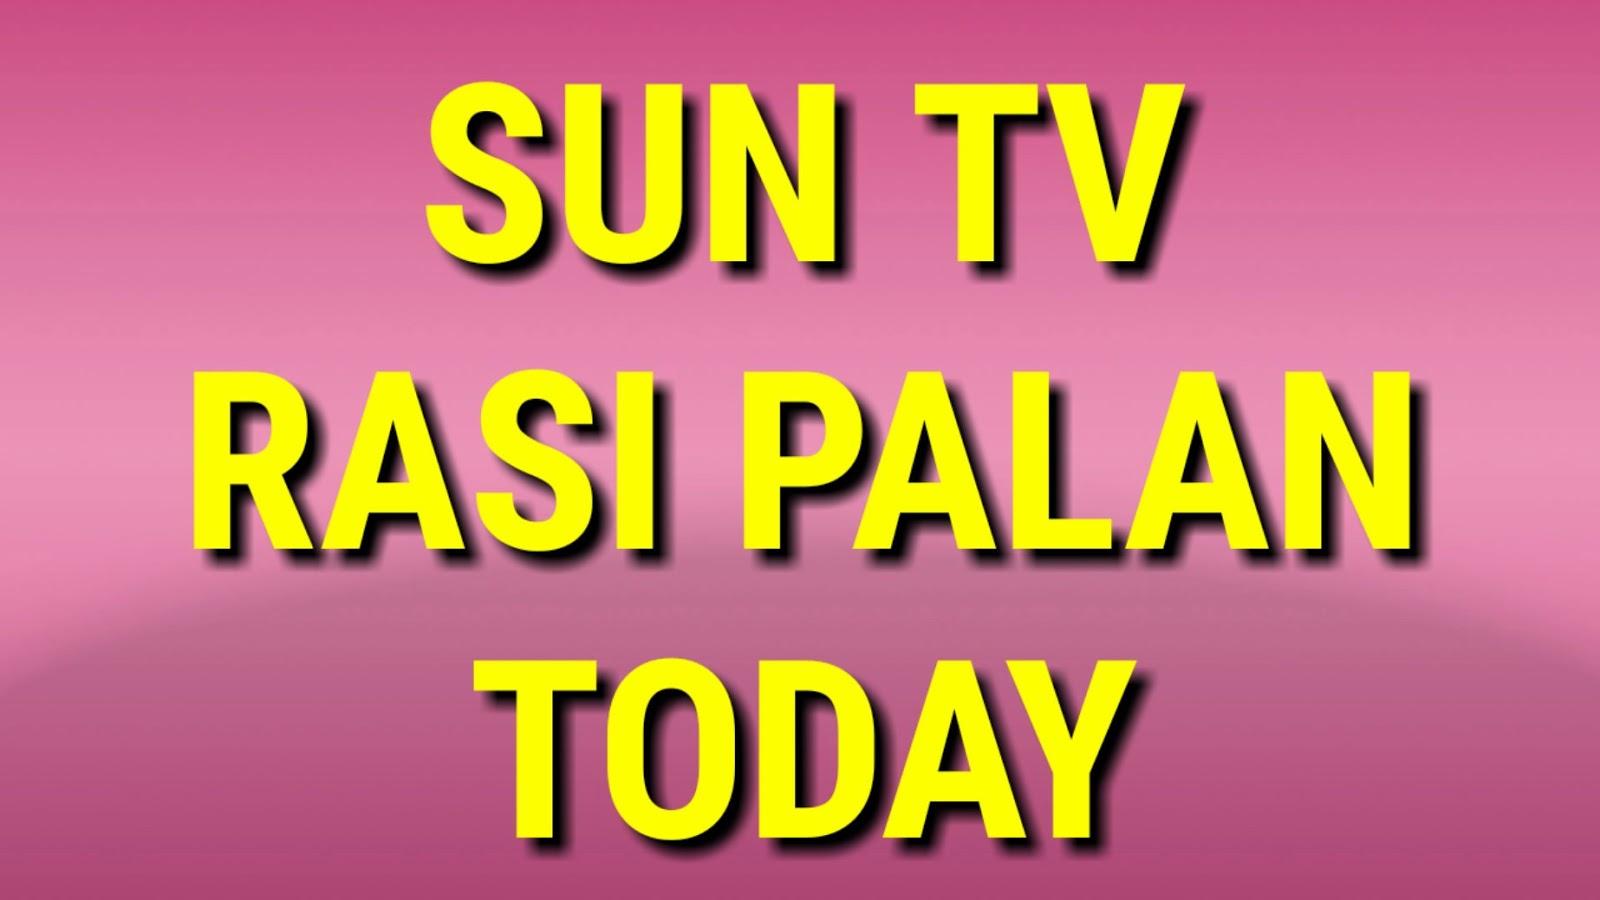 Tamil rasi palan today 15-08-2019 salem astrologer balaji